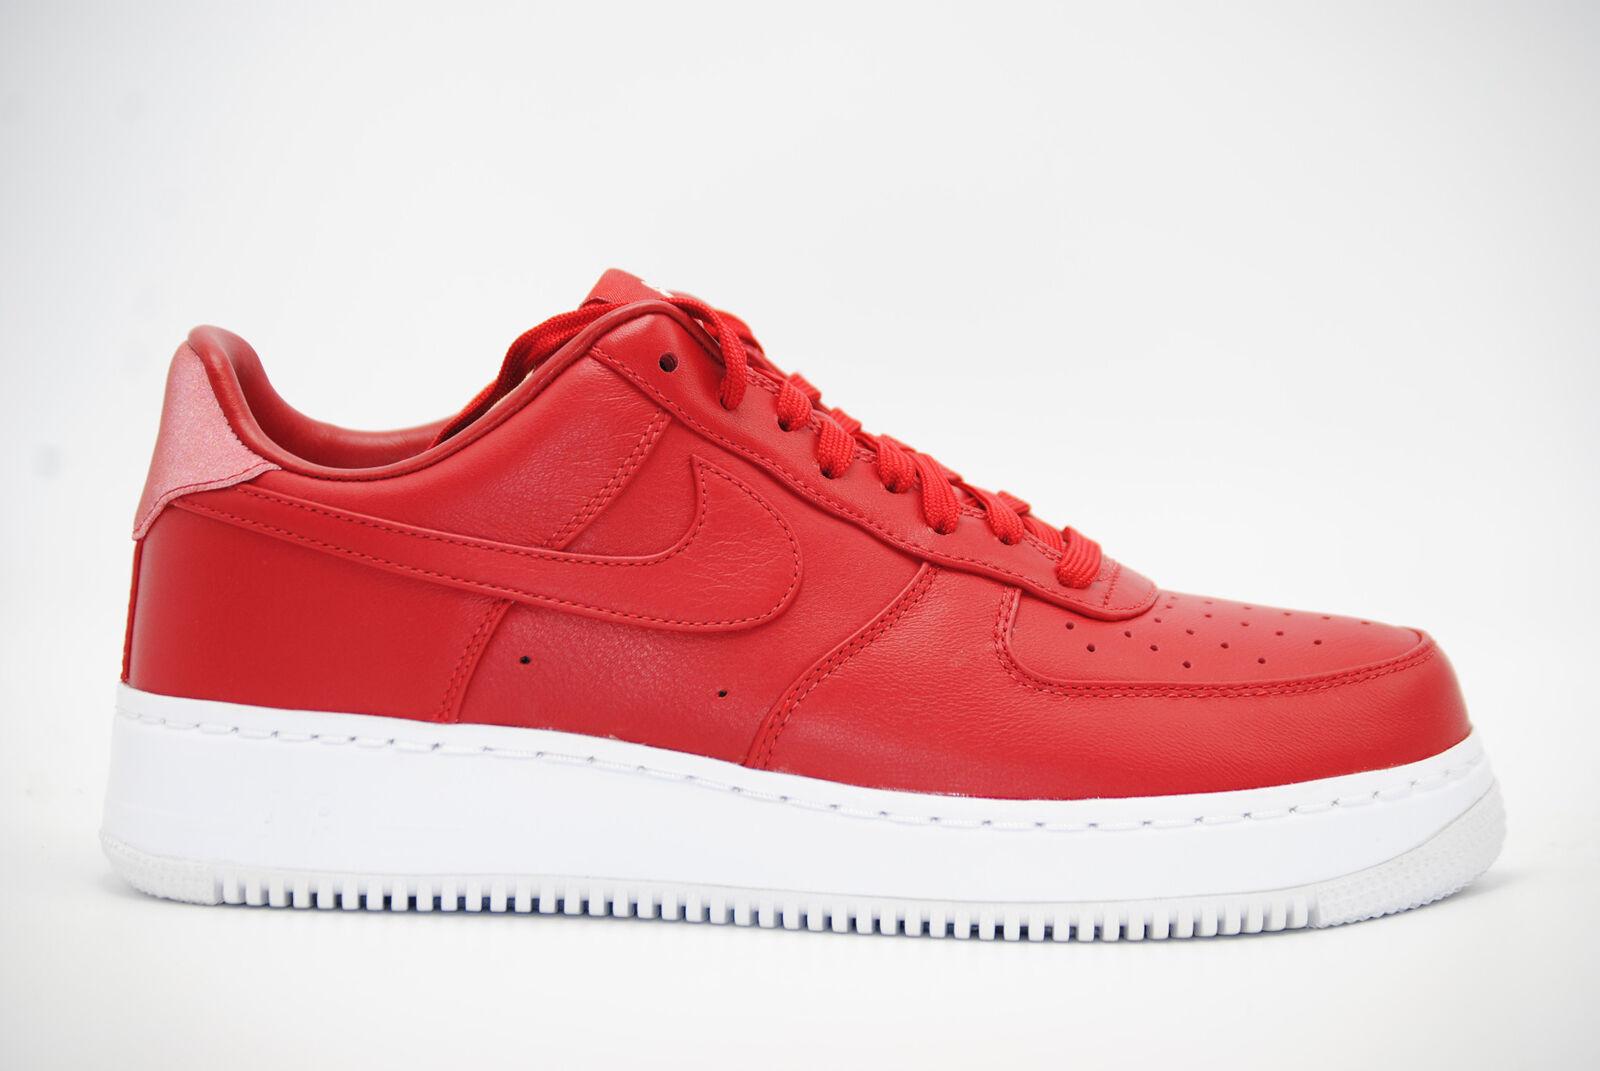 834b072f58d4 NikeLab Air Force 1 Low Af1 One Gym Red Leather Men SNEAKERS Nike ...